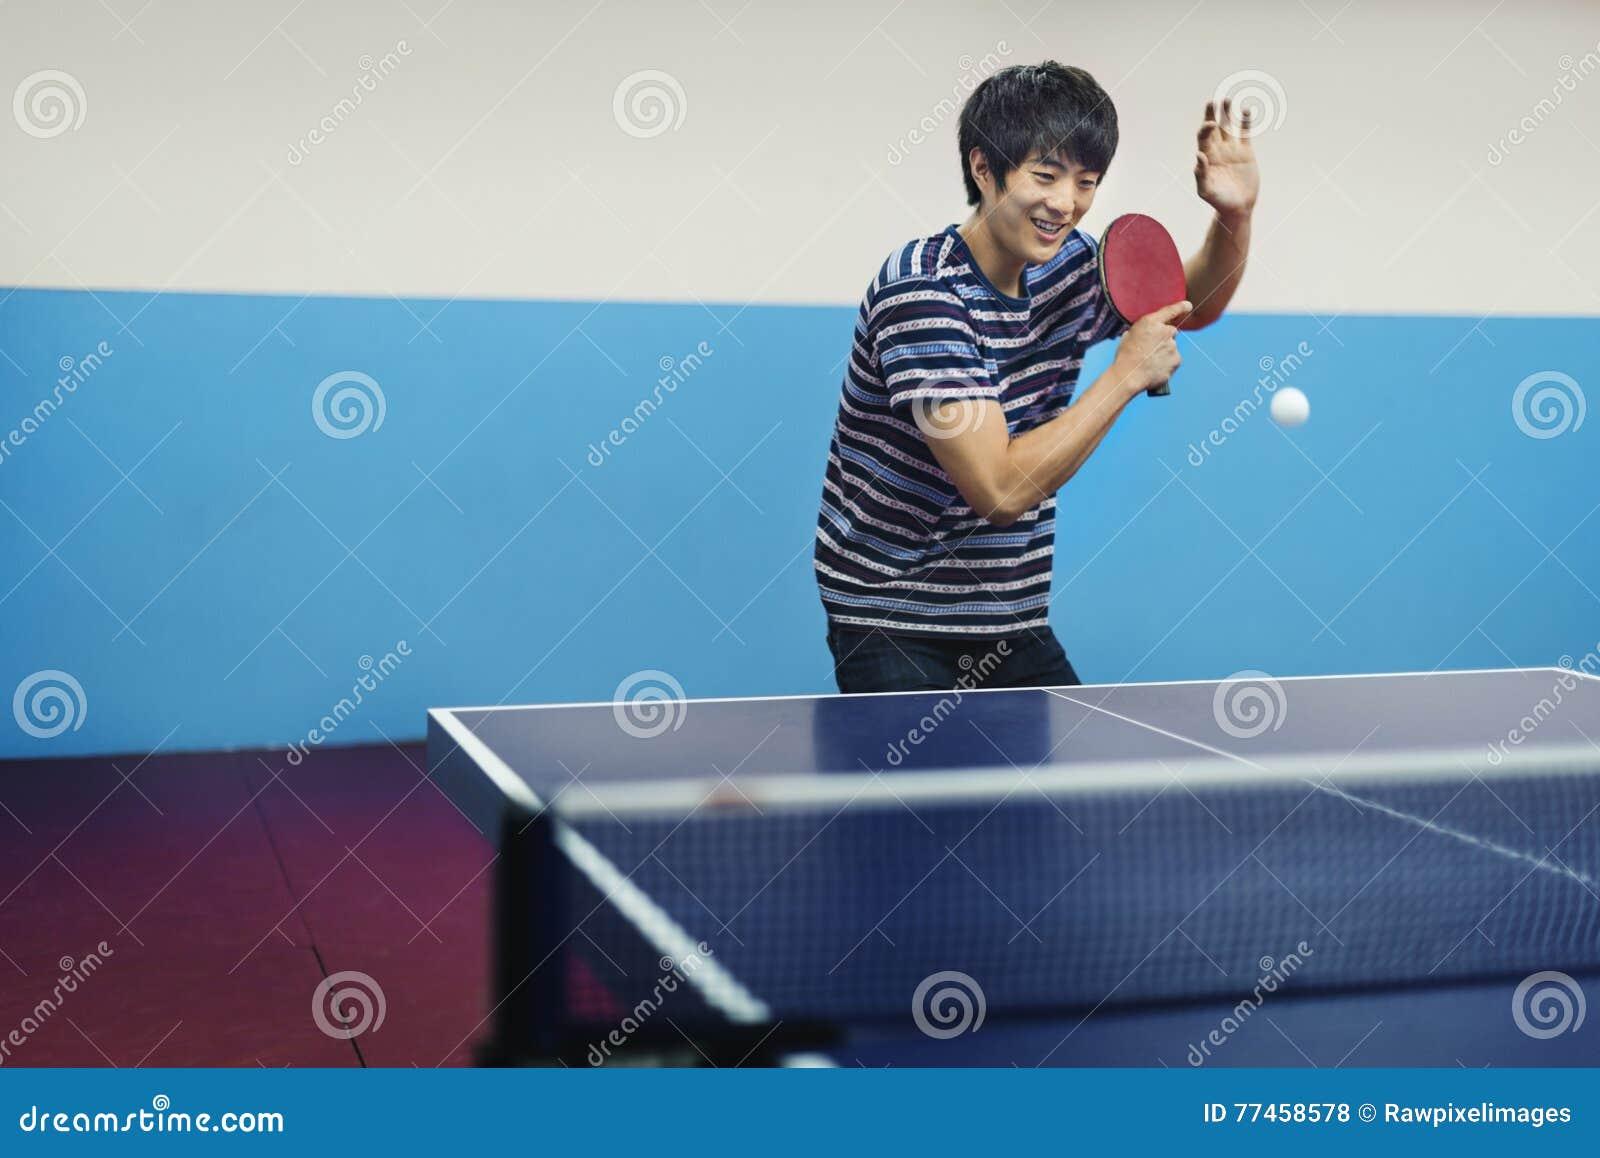 Table-Tennis Athlete Ping-Pong Sportman Sport Concept